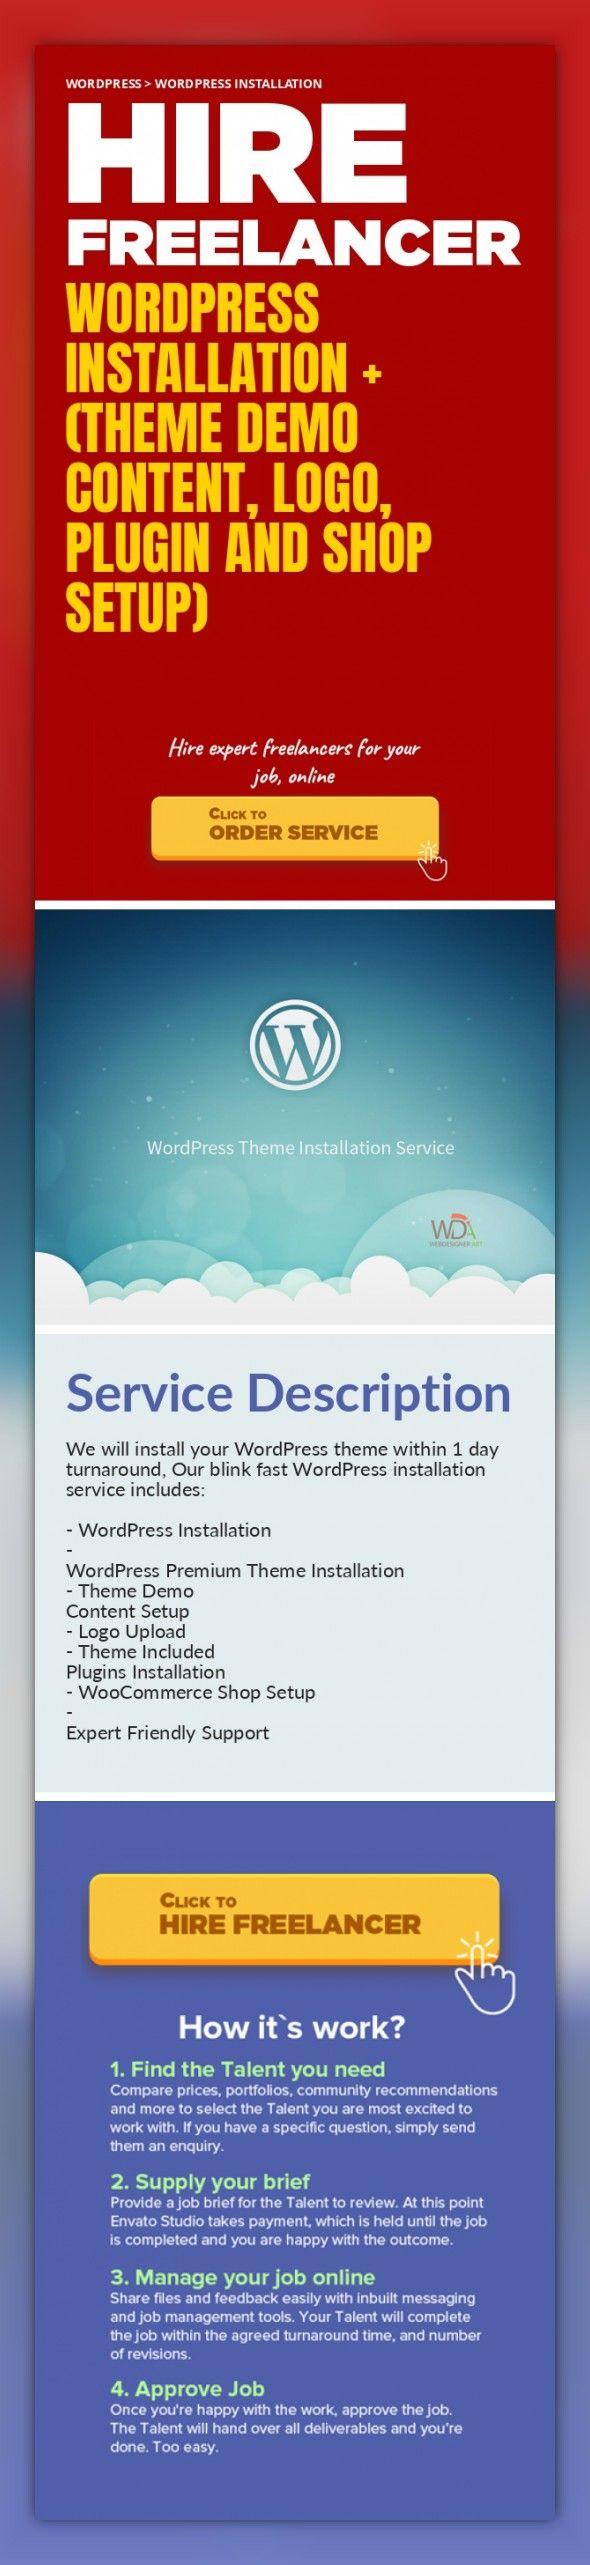 WordPress Installation + (Theme Demo Content, Logo, Plugin and Shop Setup) WordPress, WordPress Installation   We will install your WordPress theme within 1 day turnaround, Our blink fast WordPress installation service includes:     - WordPress Installation   - WordPress Premium Theme Installation   - Theme Demo Content Setup  - Logo Upload  - Theme Included Plugins Installation  - WooCommerce Sho...